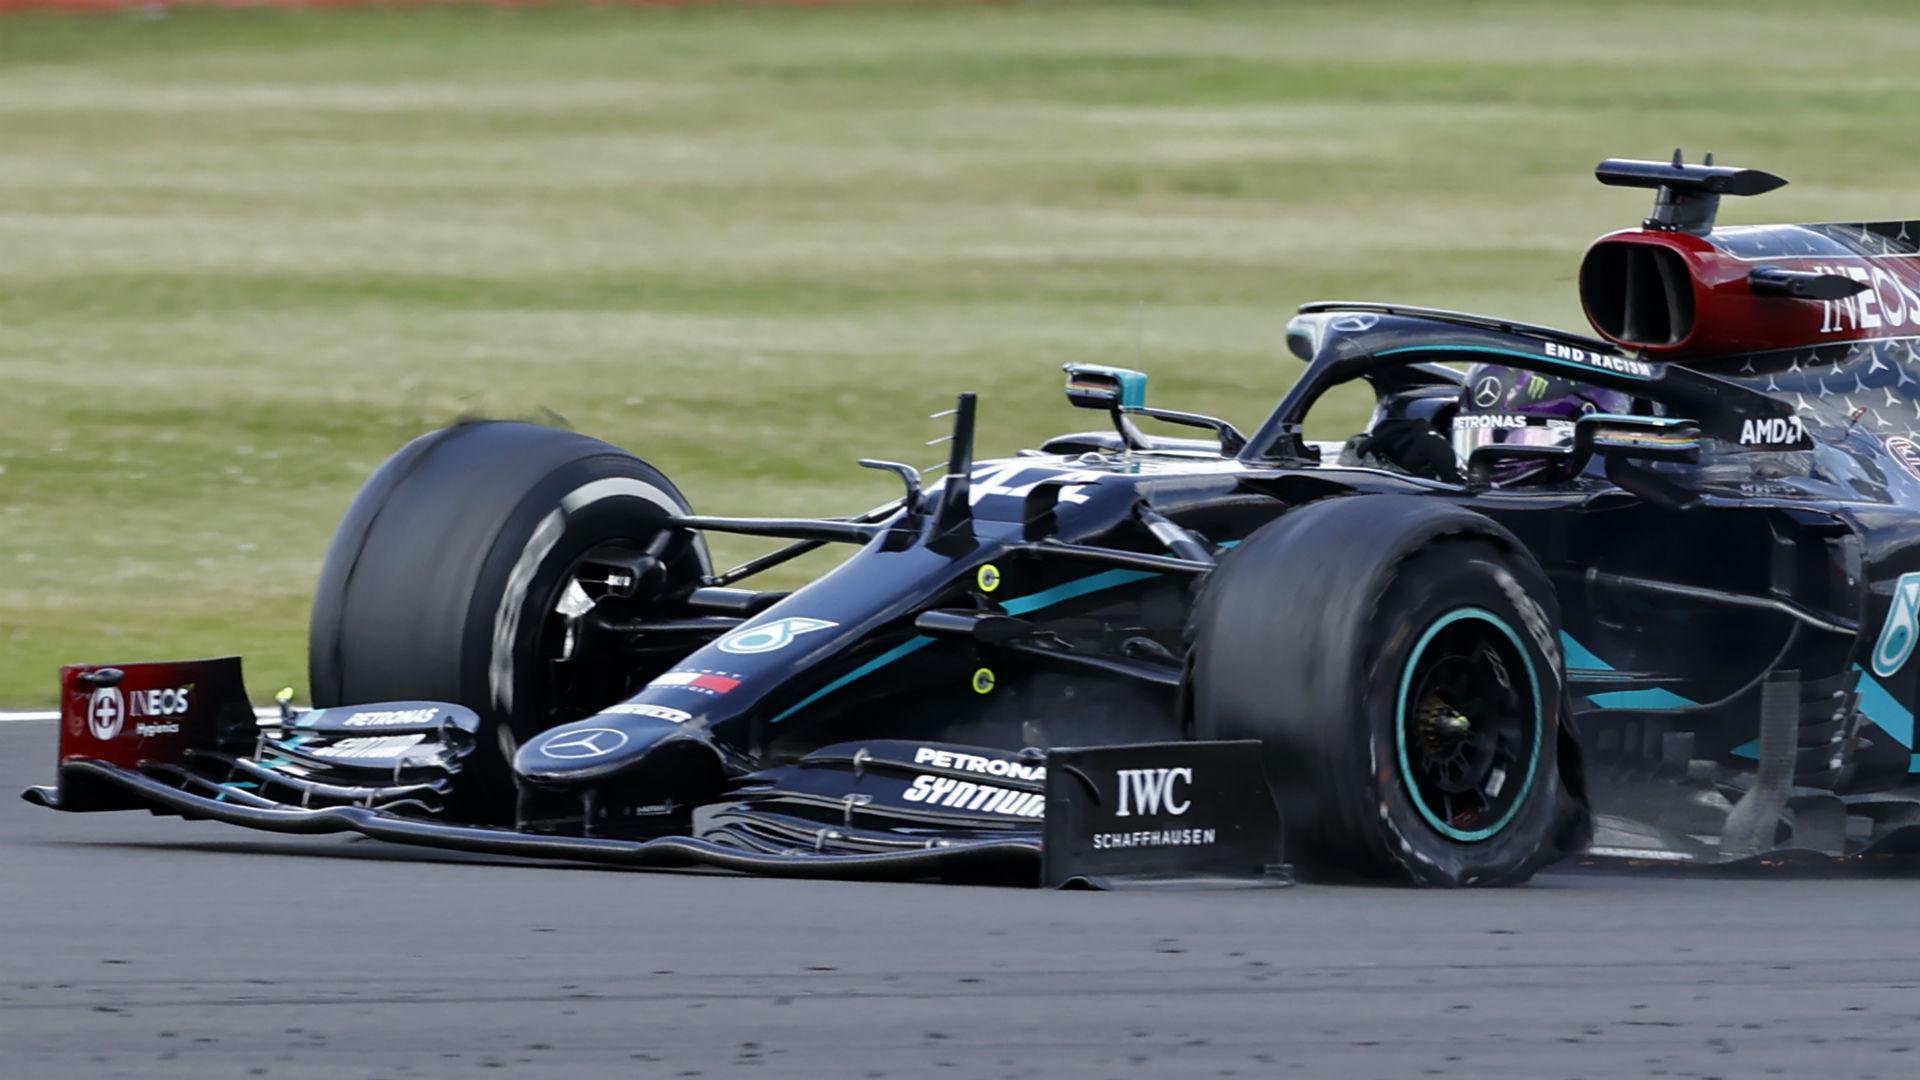 Lewis-Hamilton-Getty-FTR-080220